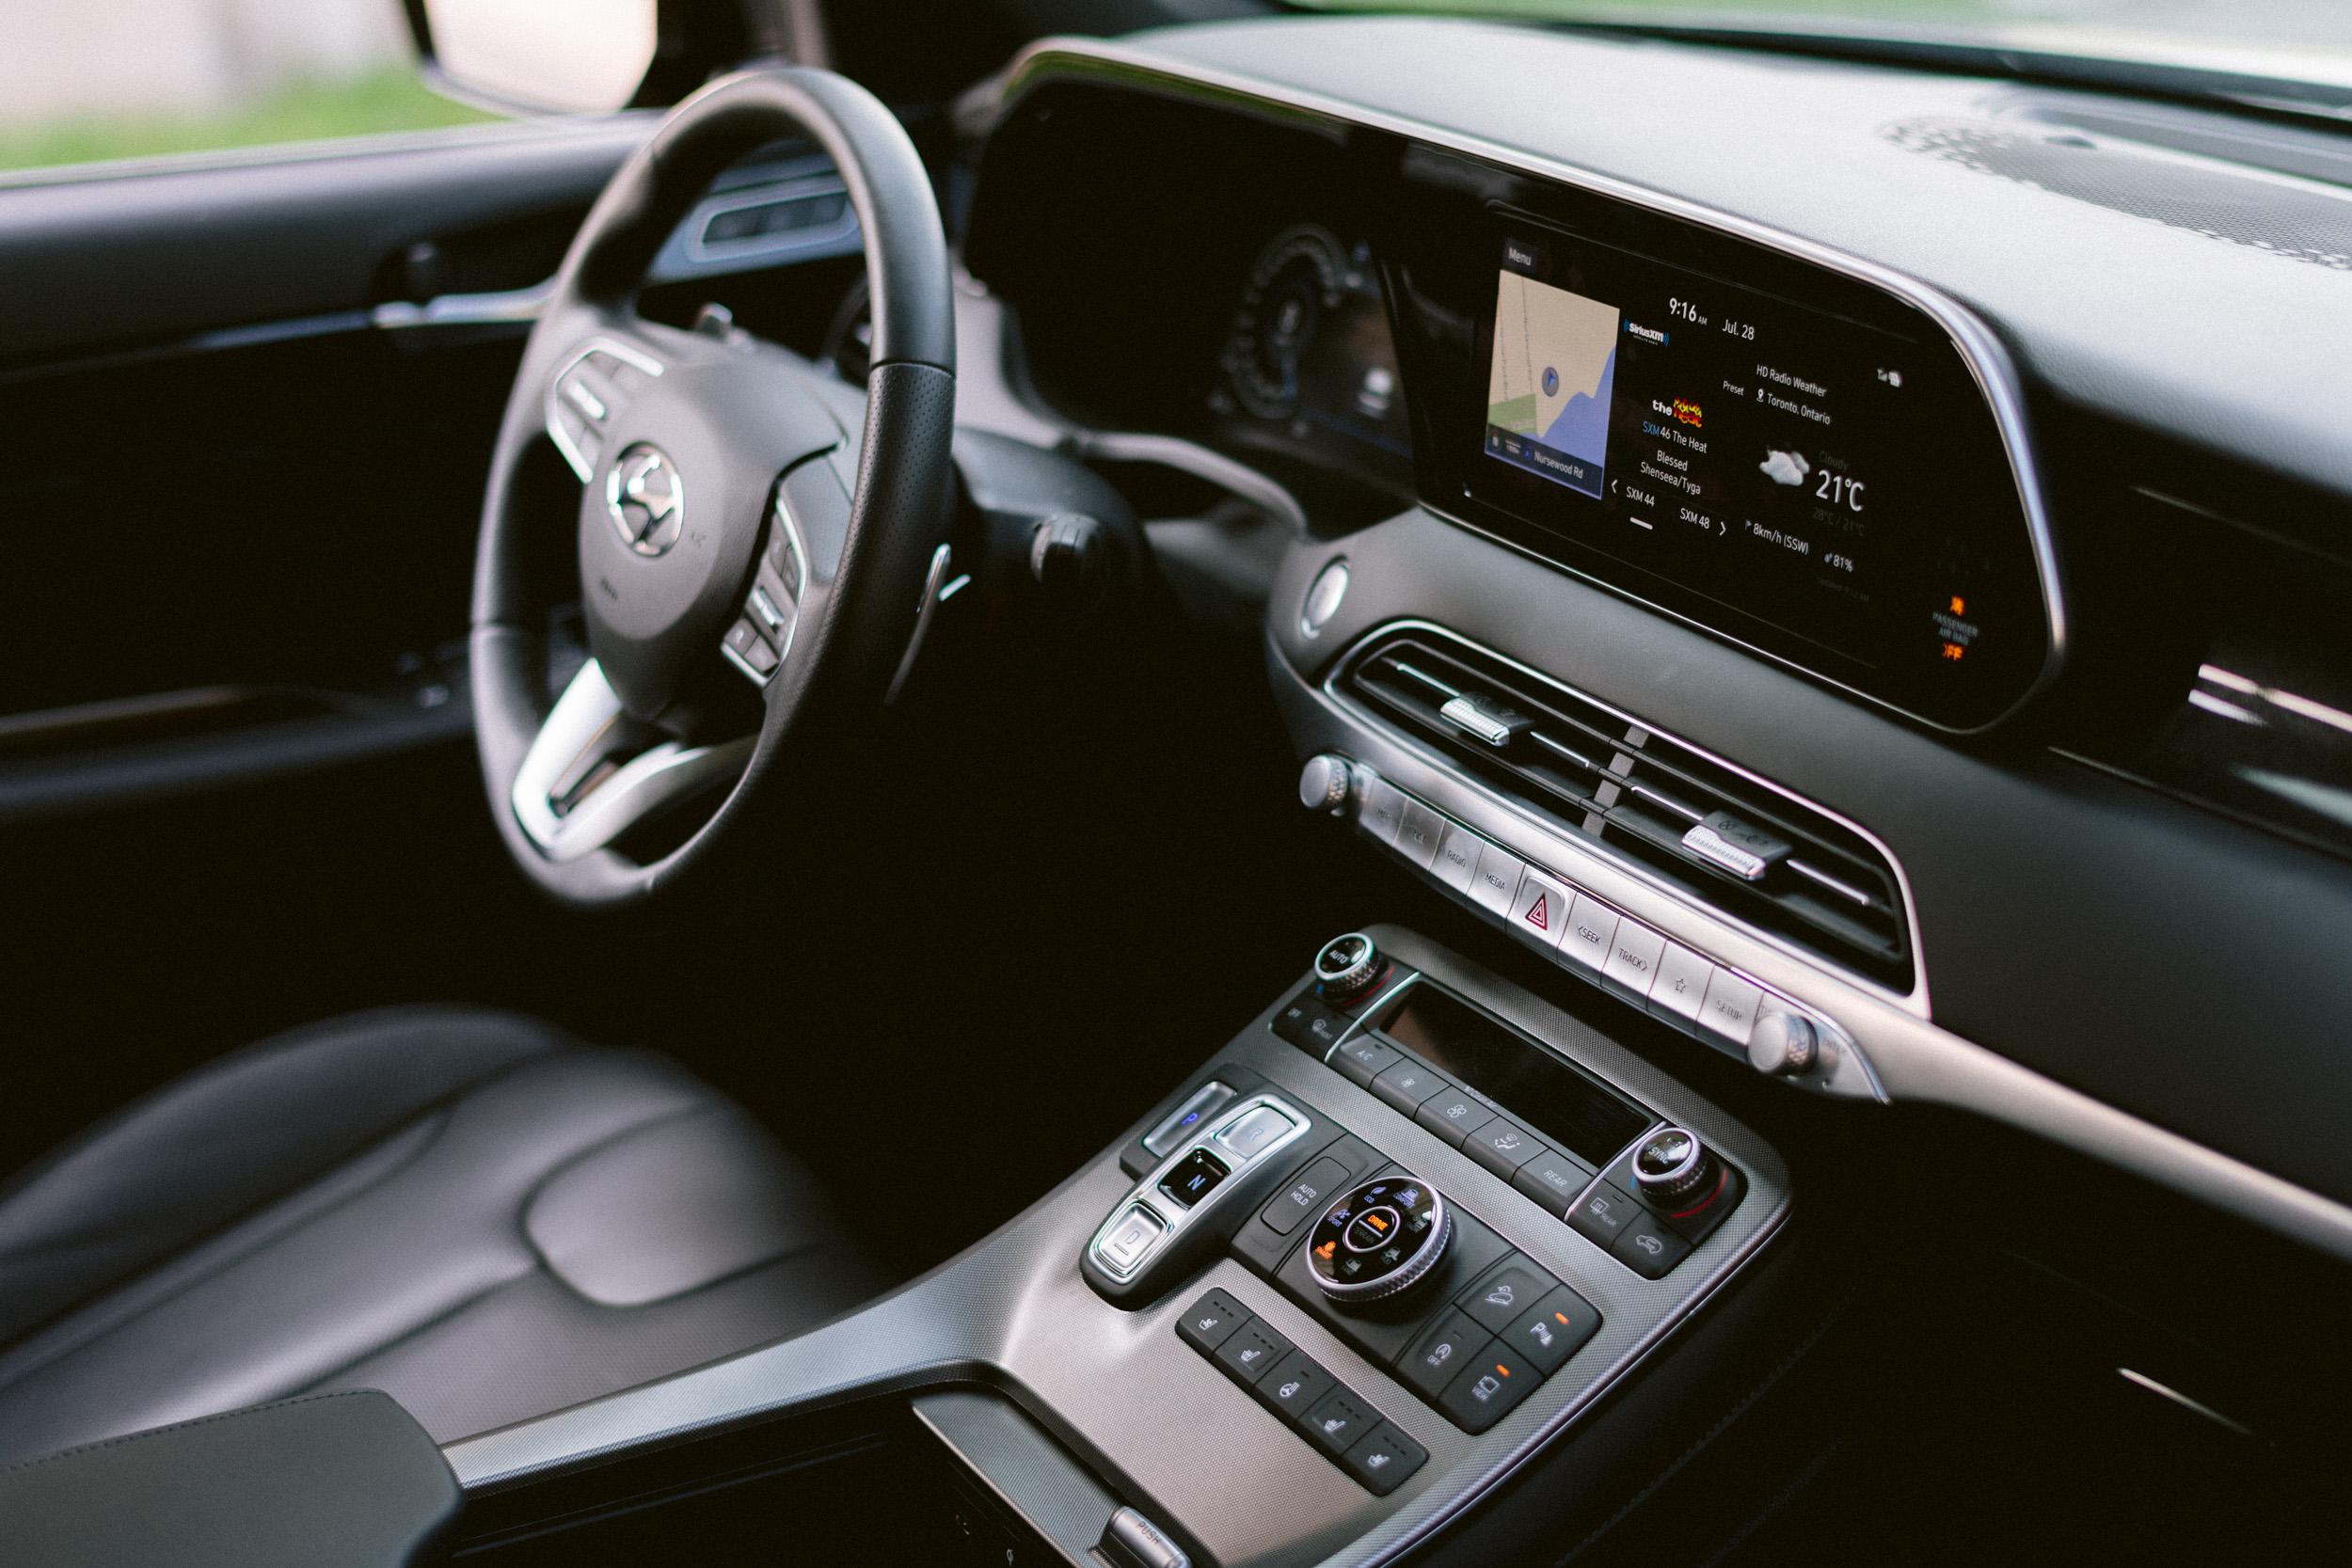 Hyundai x NoTummyMommy WEB-8585.jpg